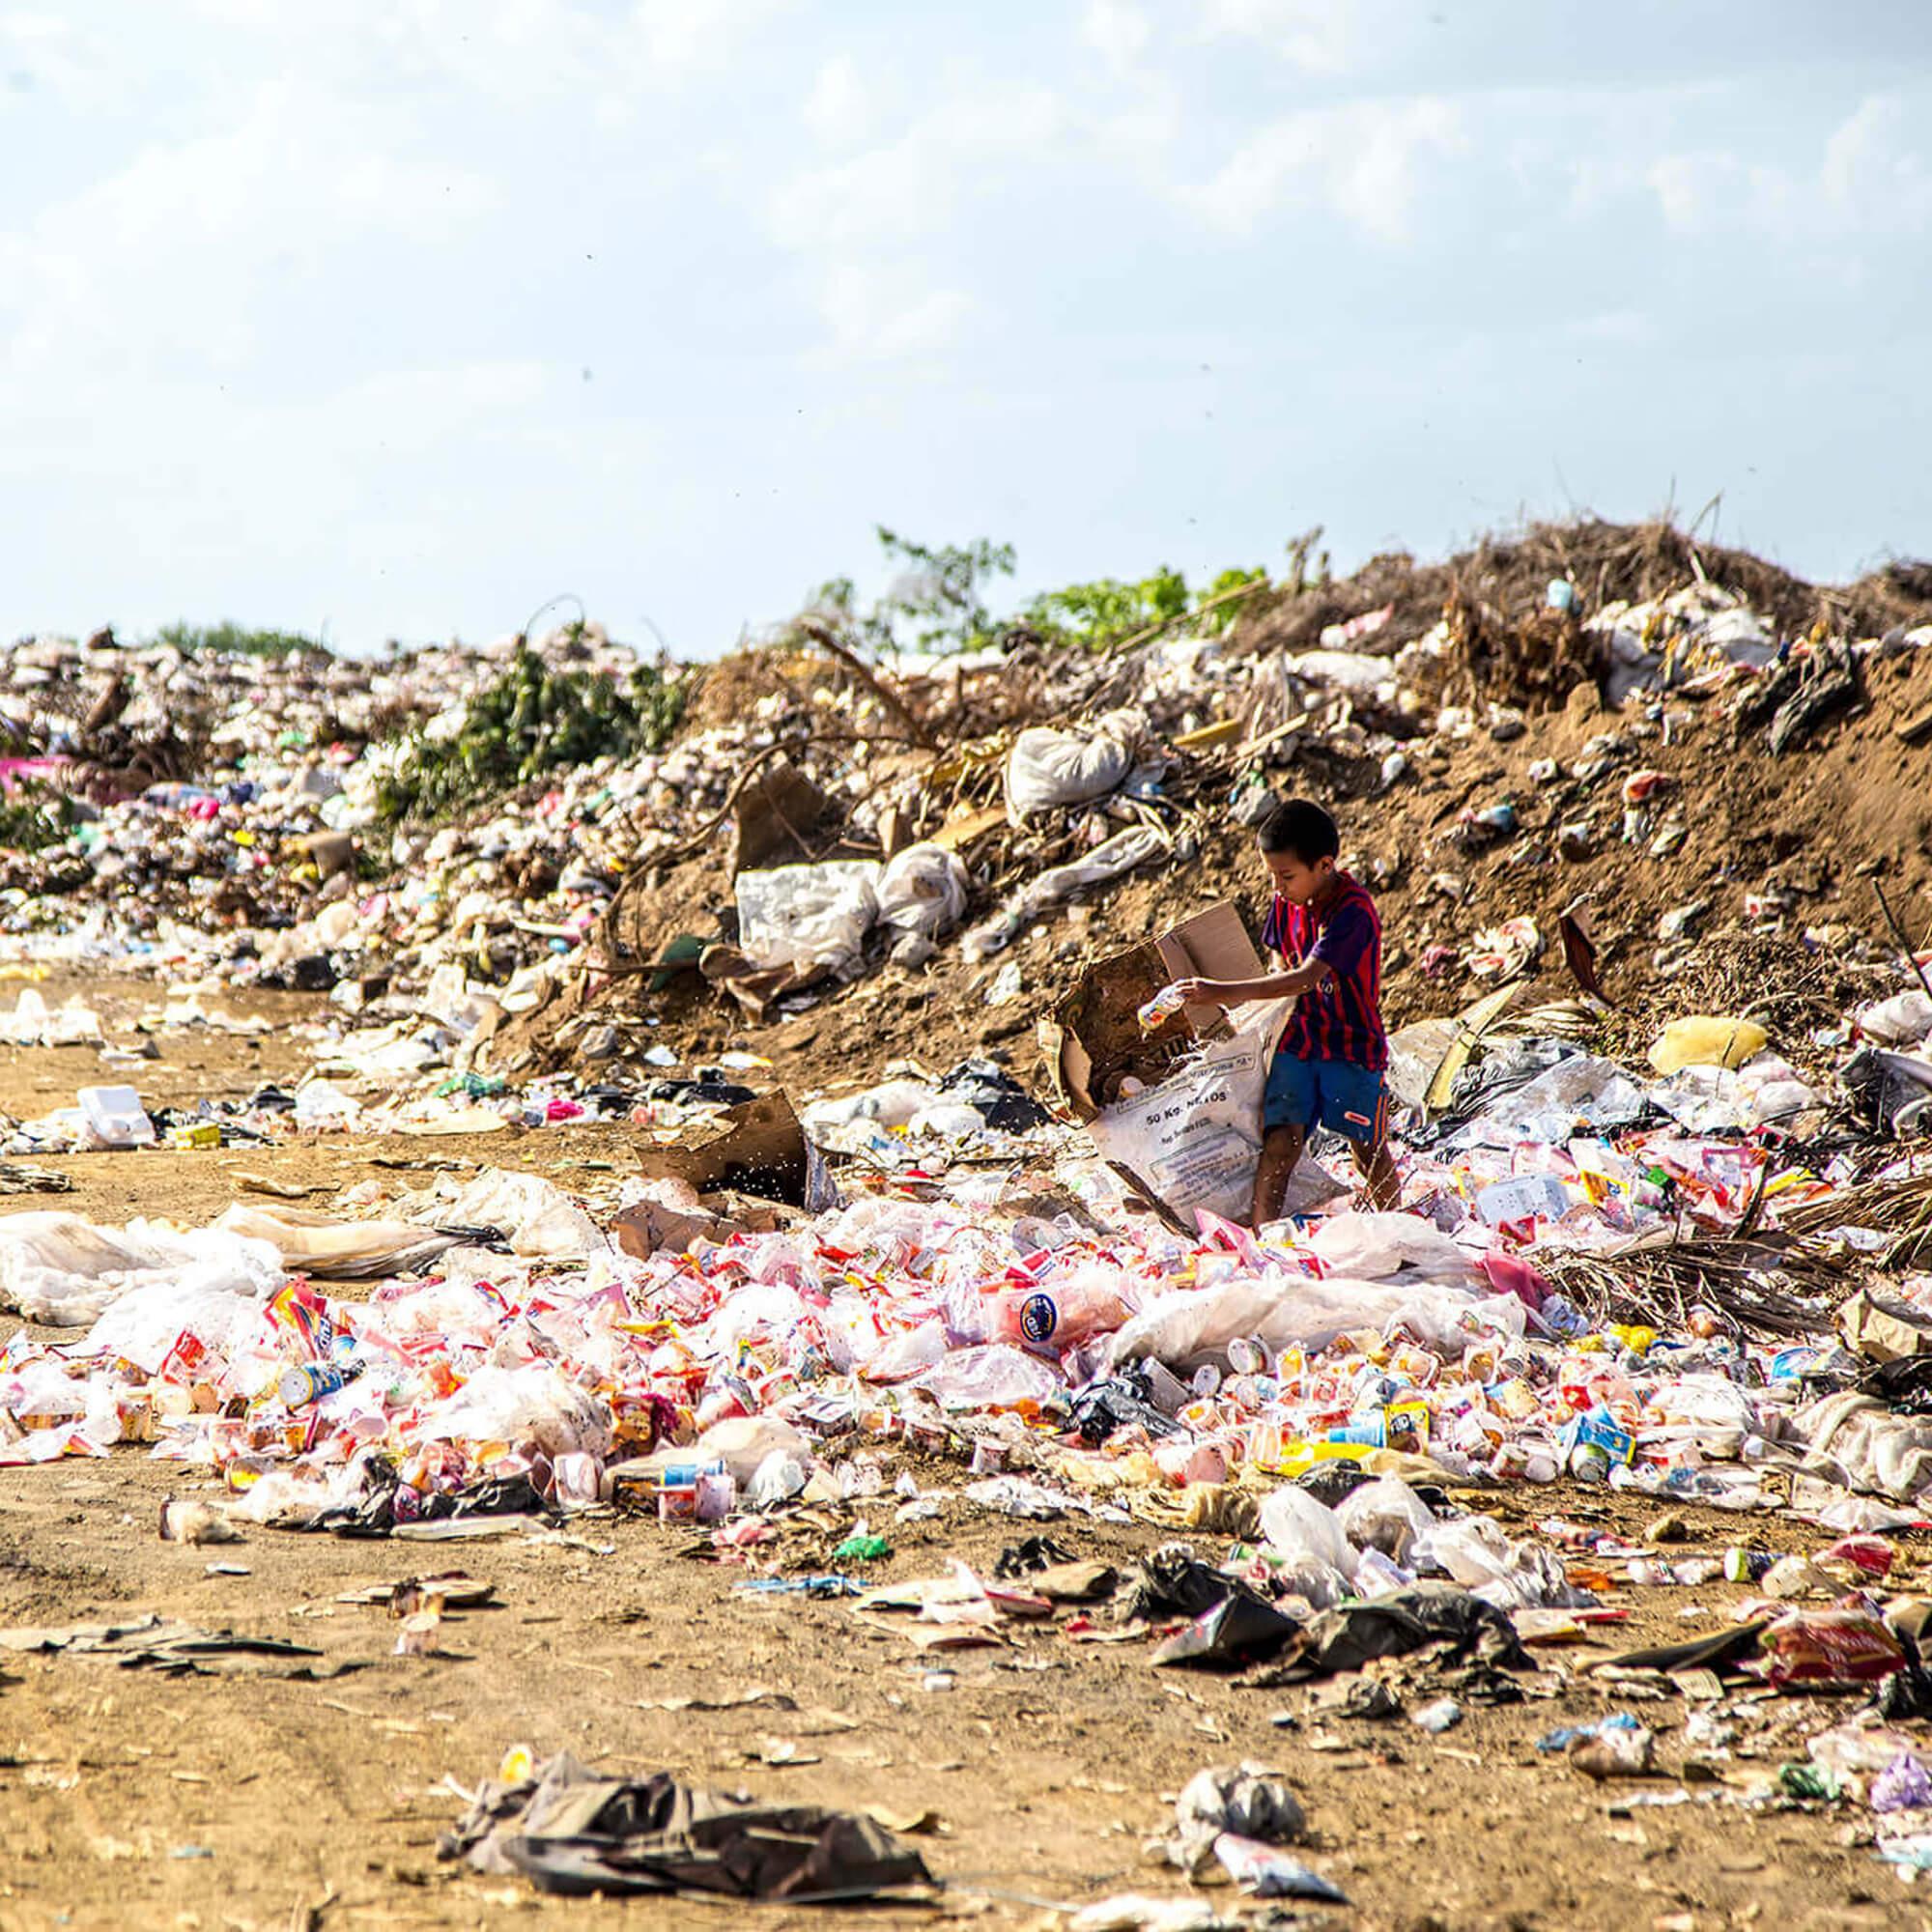 A young boy climbing through a pile of litter.